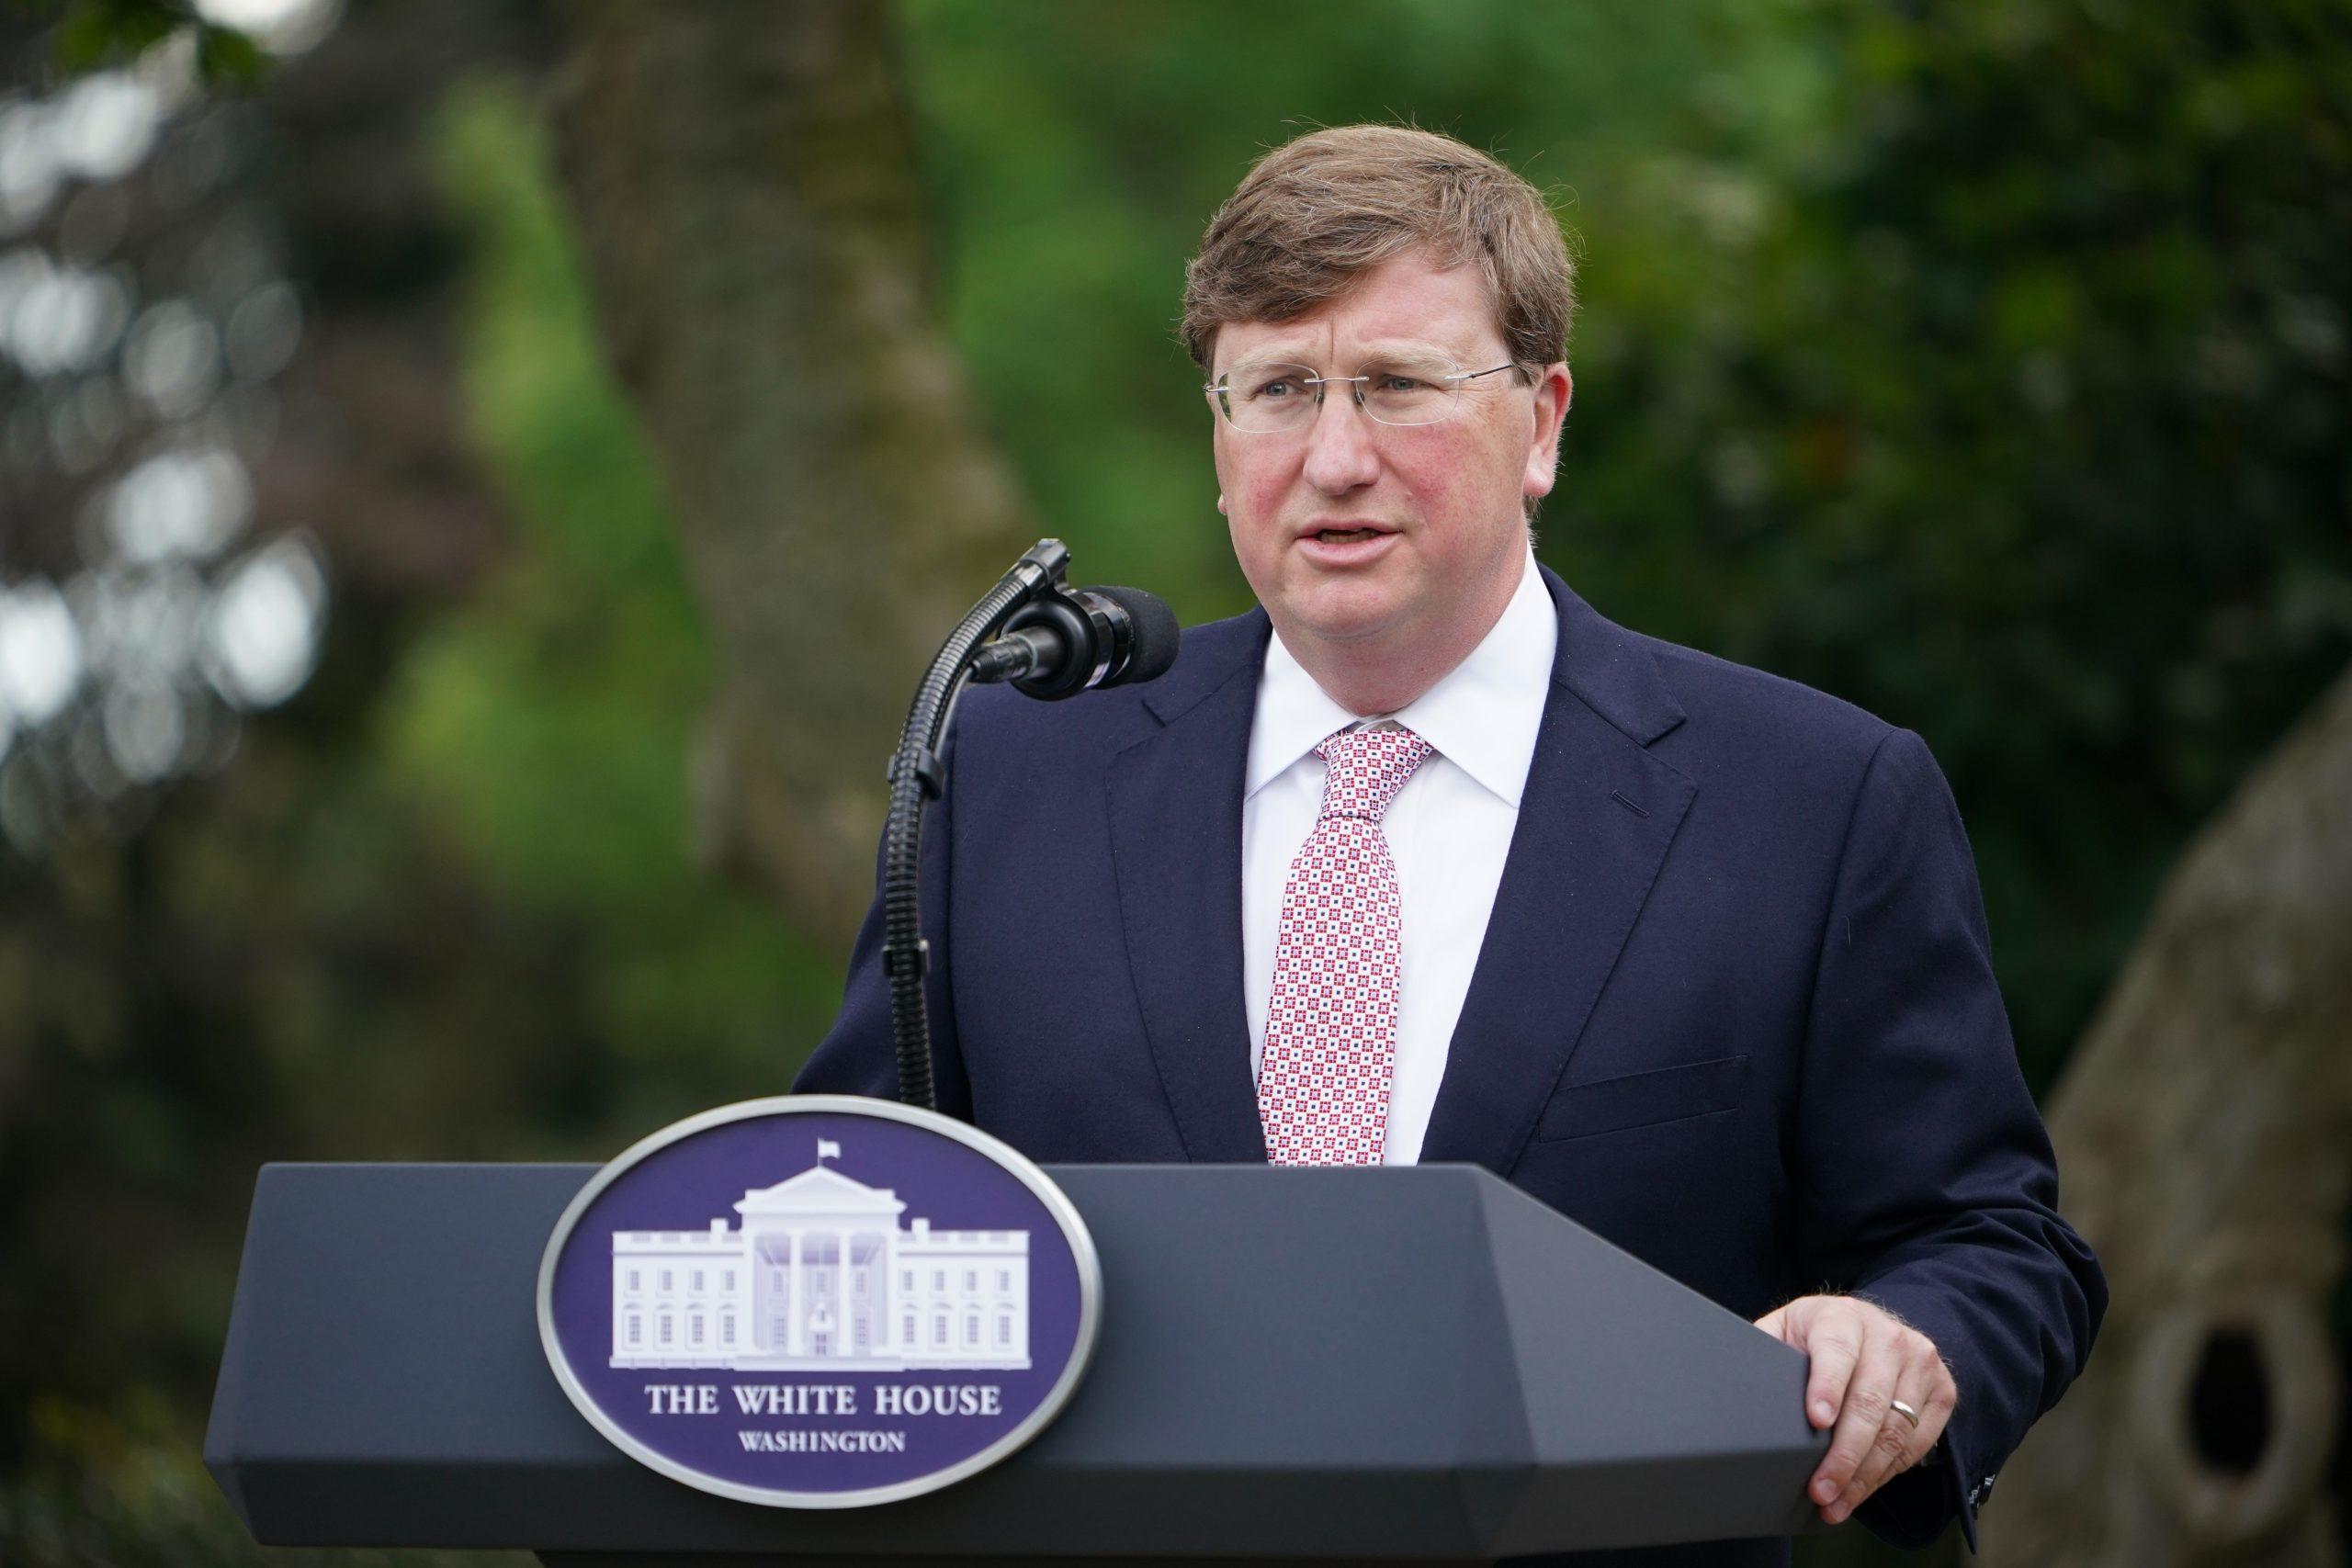 Mississippi Gov. Tate Reeves speaks at the White House on Sept. 28. (Mandel Ngan/AFP via Getty Images)